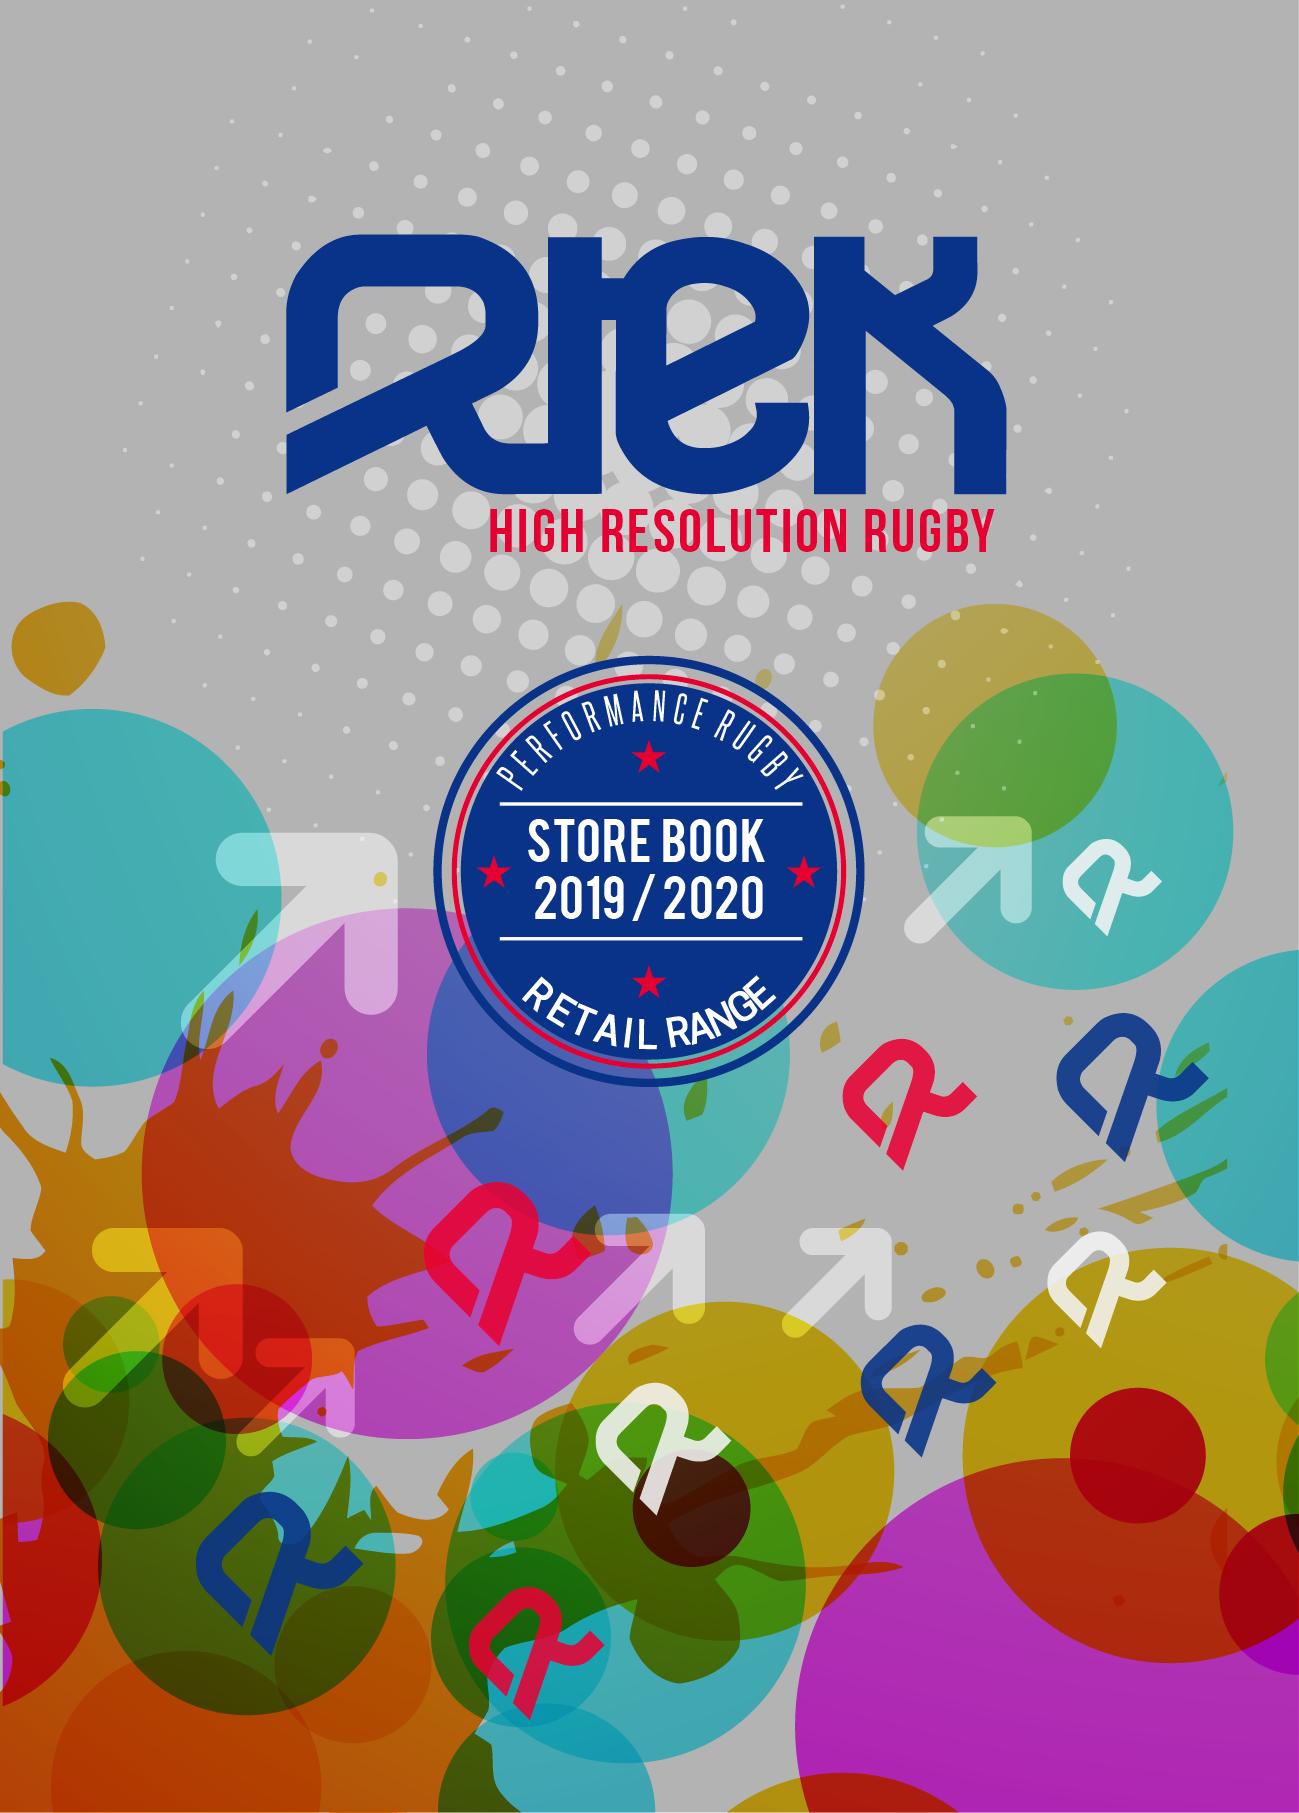 Upload RTEK retail catalog in english